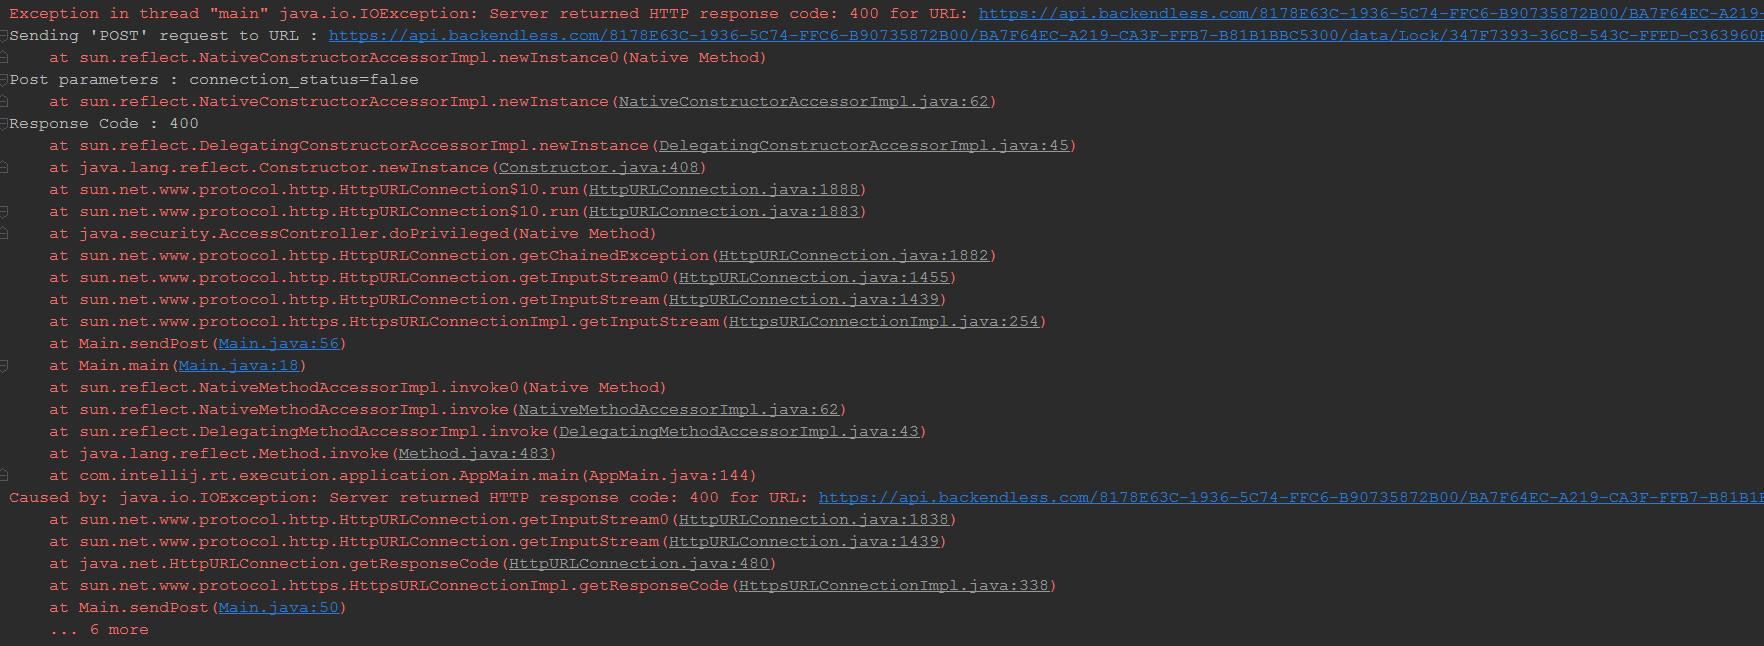 java io IOException: Server returned HTTP response code: 400